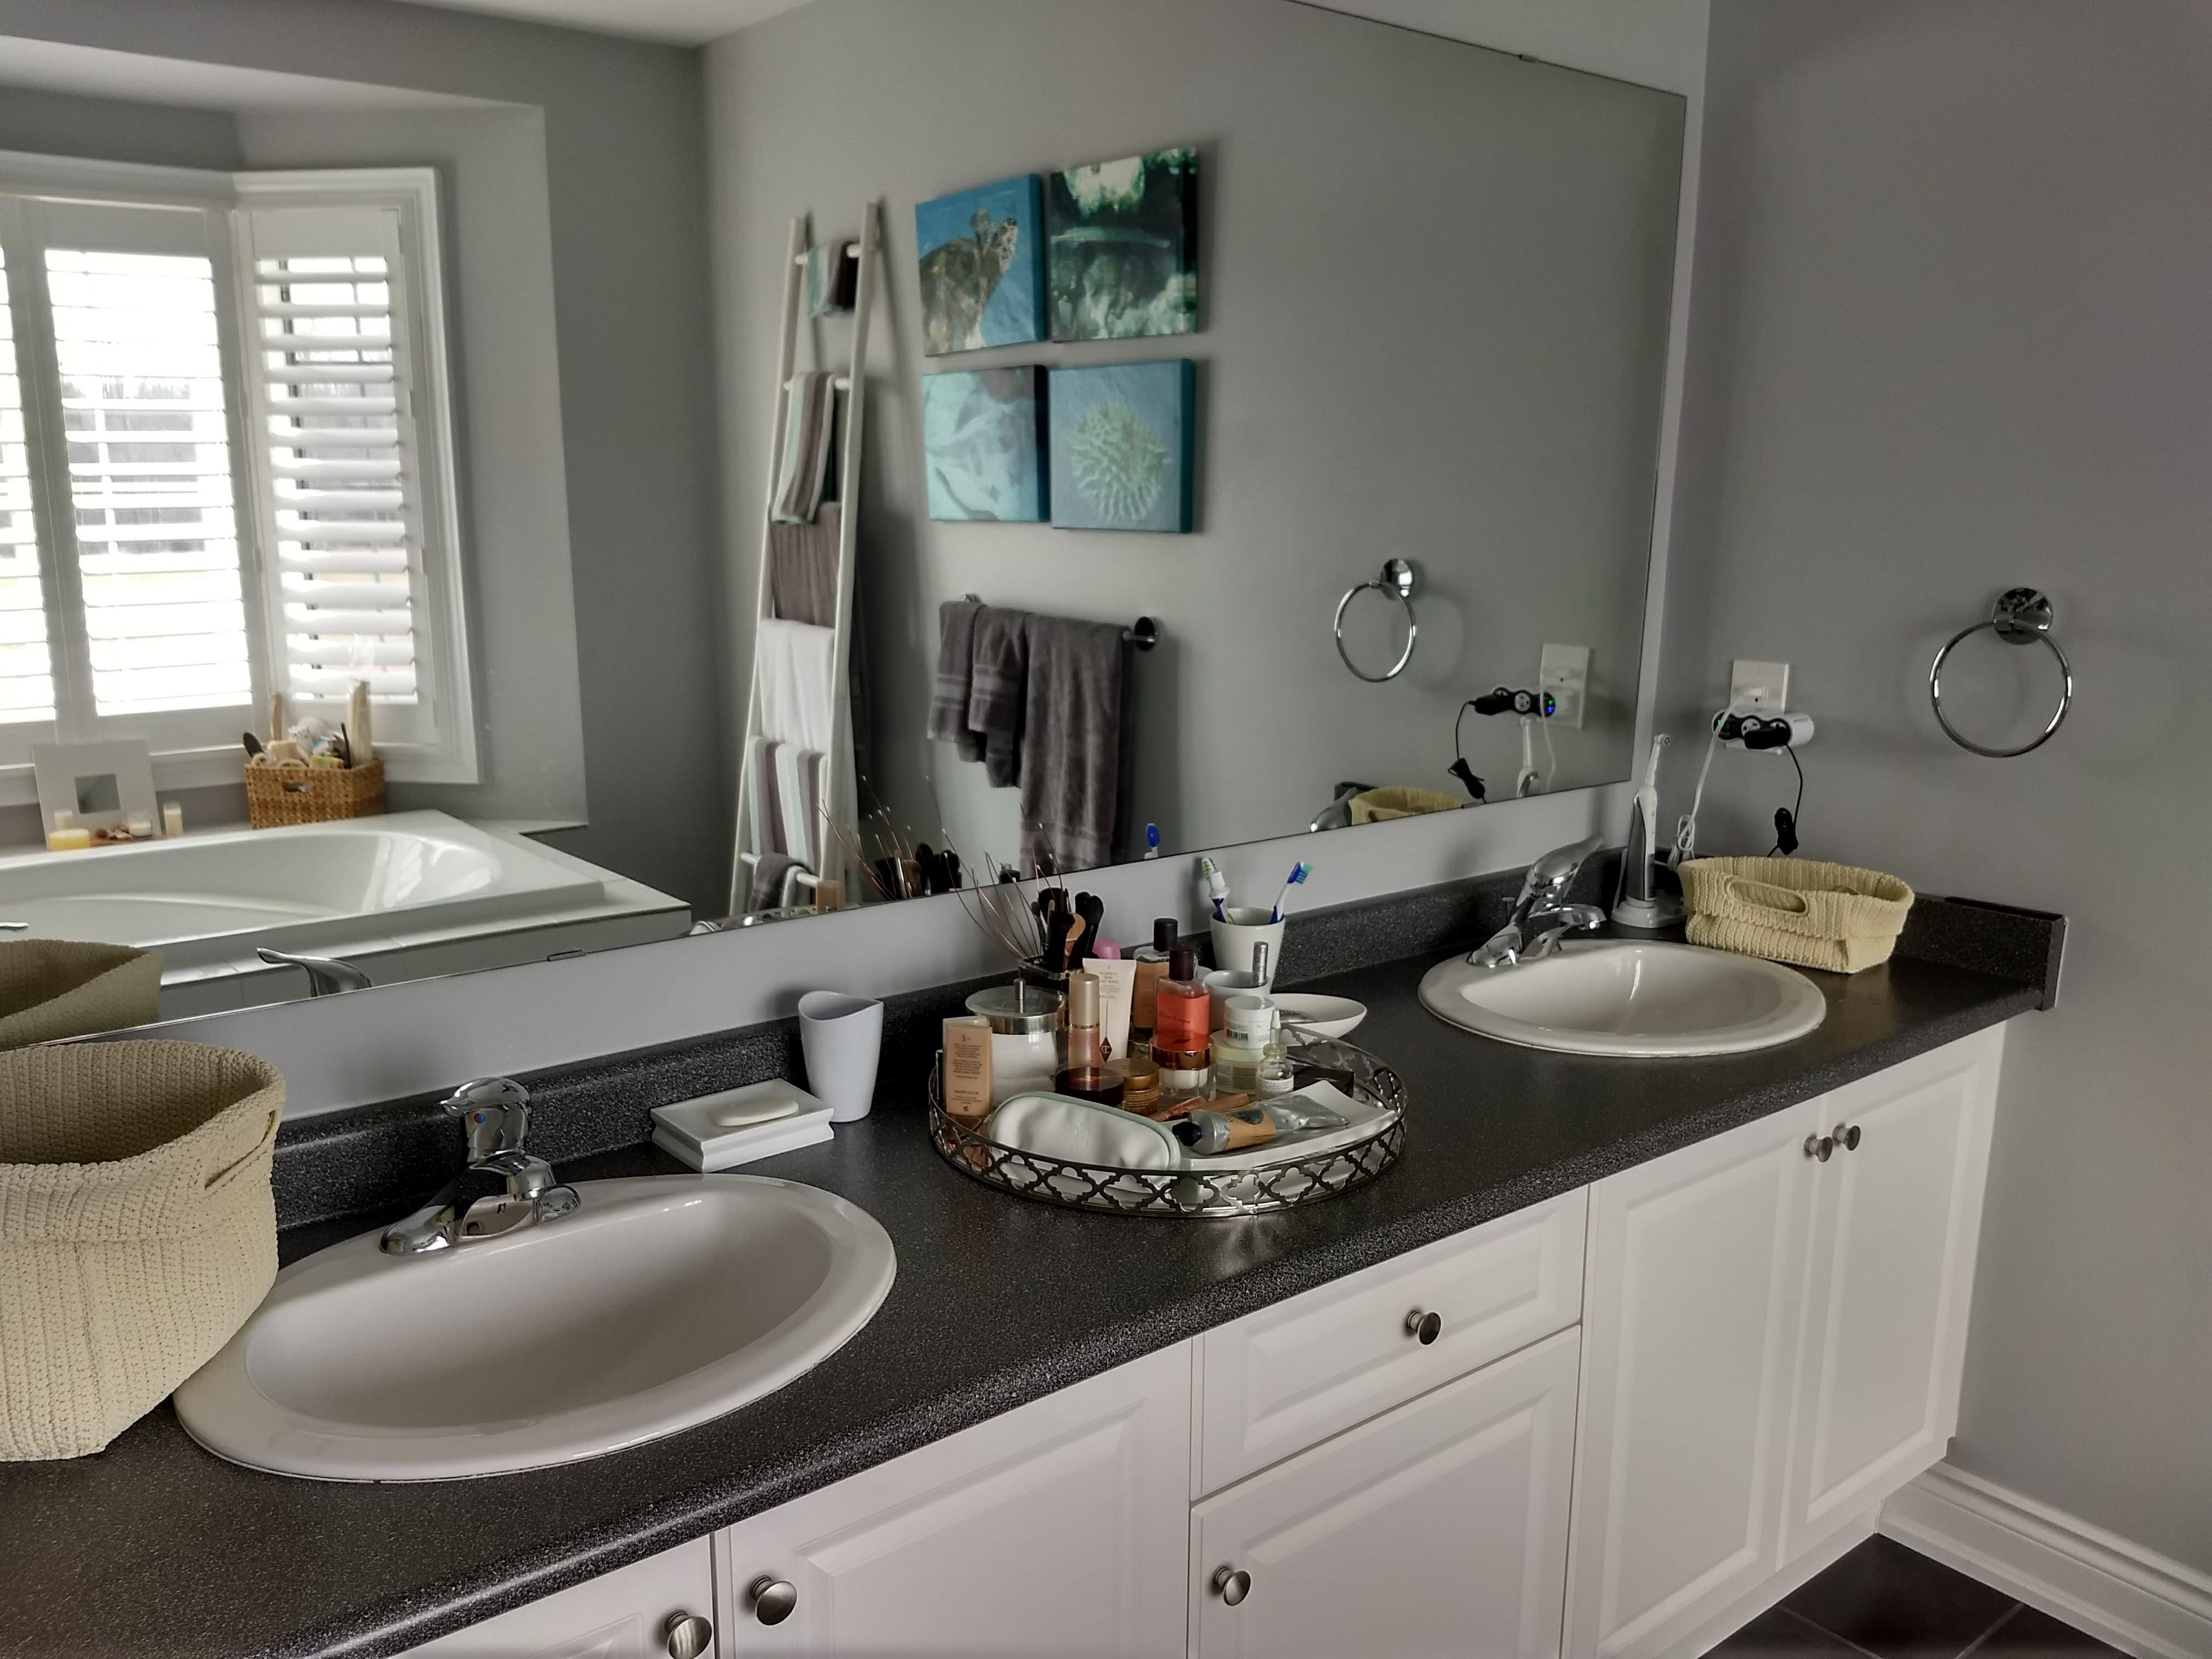 Quartz Or Granite For A Bathroom Vanity Countertop